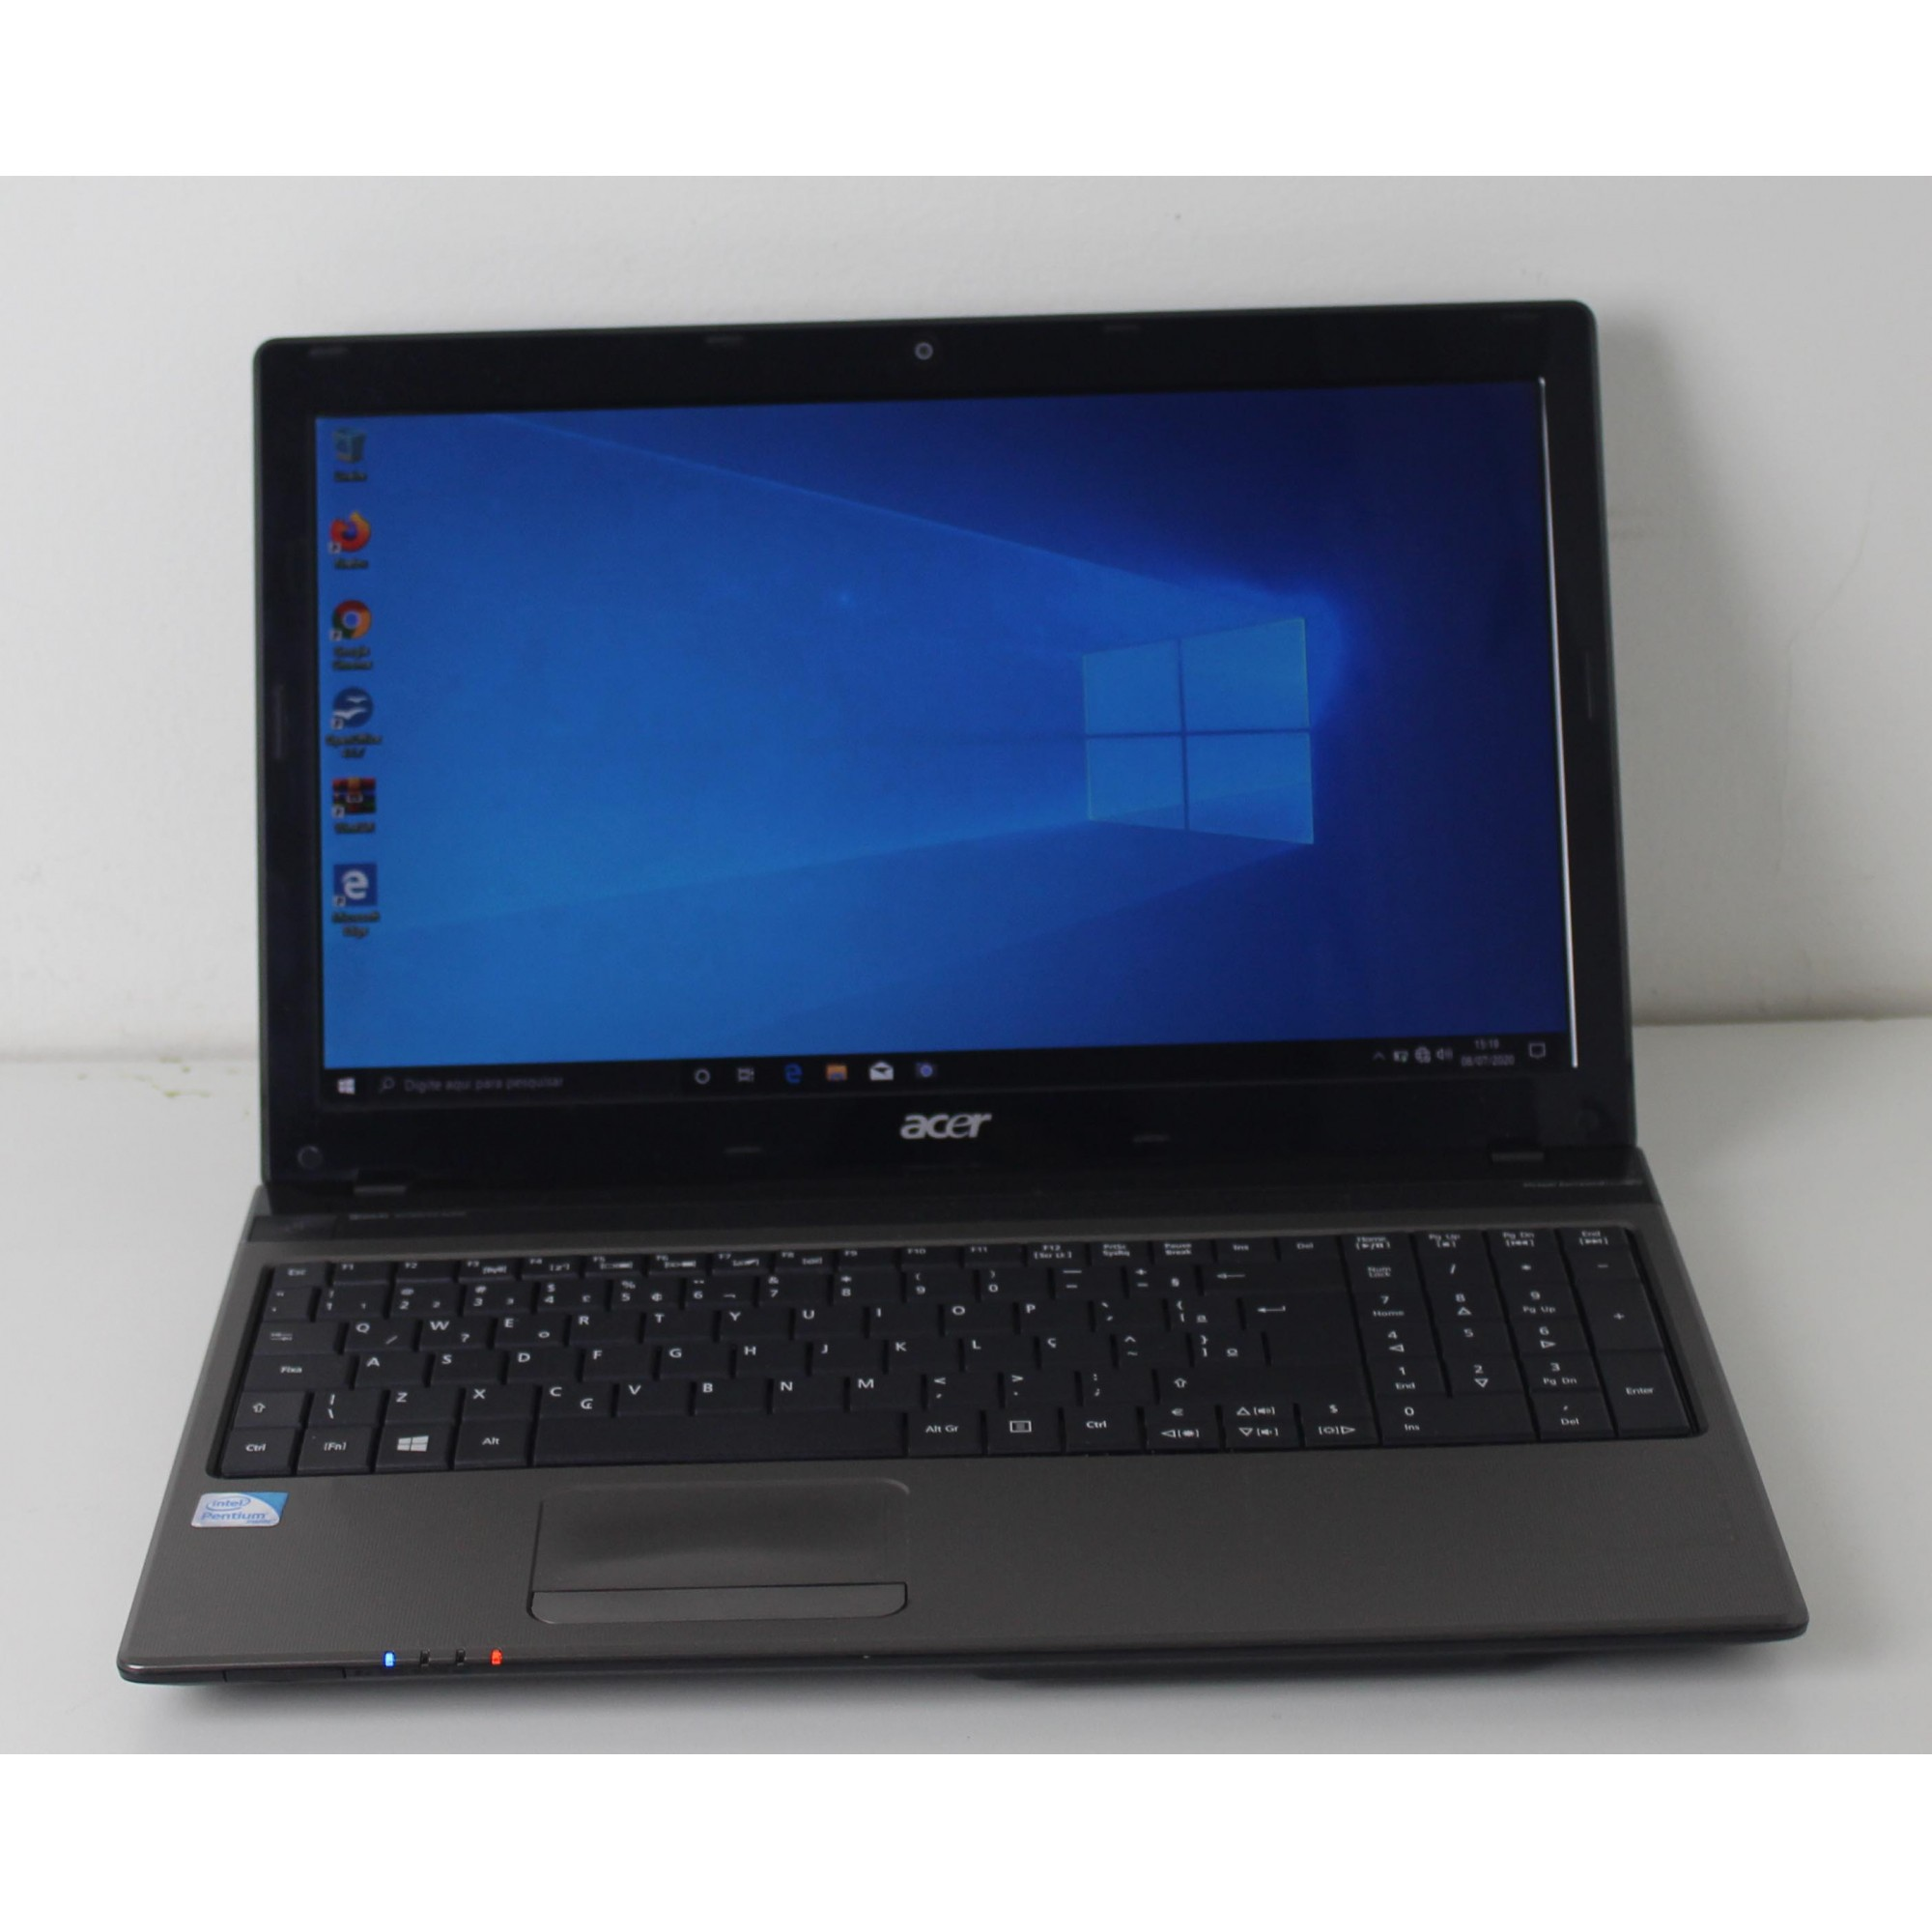 "Notebook Acer Aspire 5750Z-4633 15.6"" Intel Pentium 2.1GHz 4GB HD-500GB - Alphanumérico"